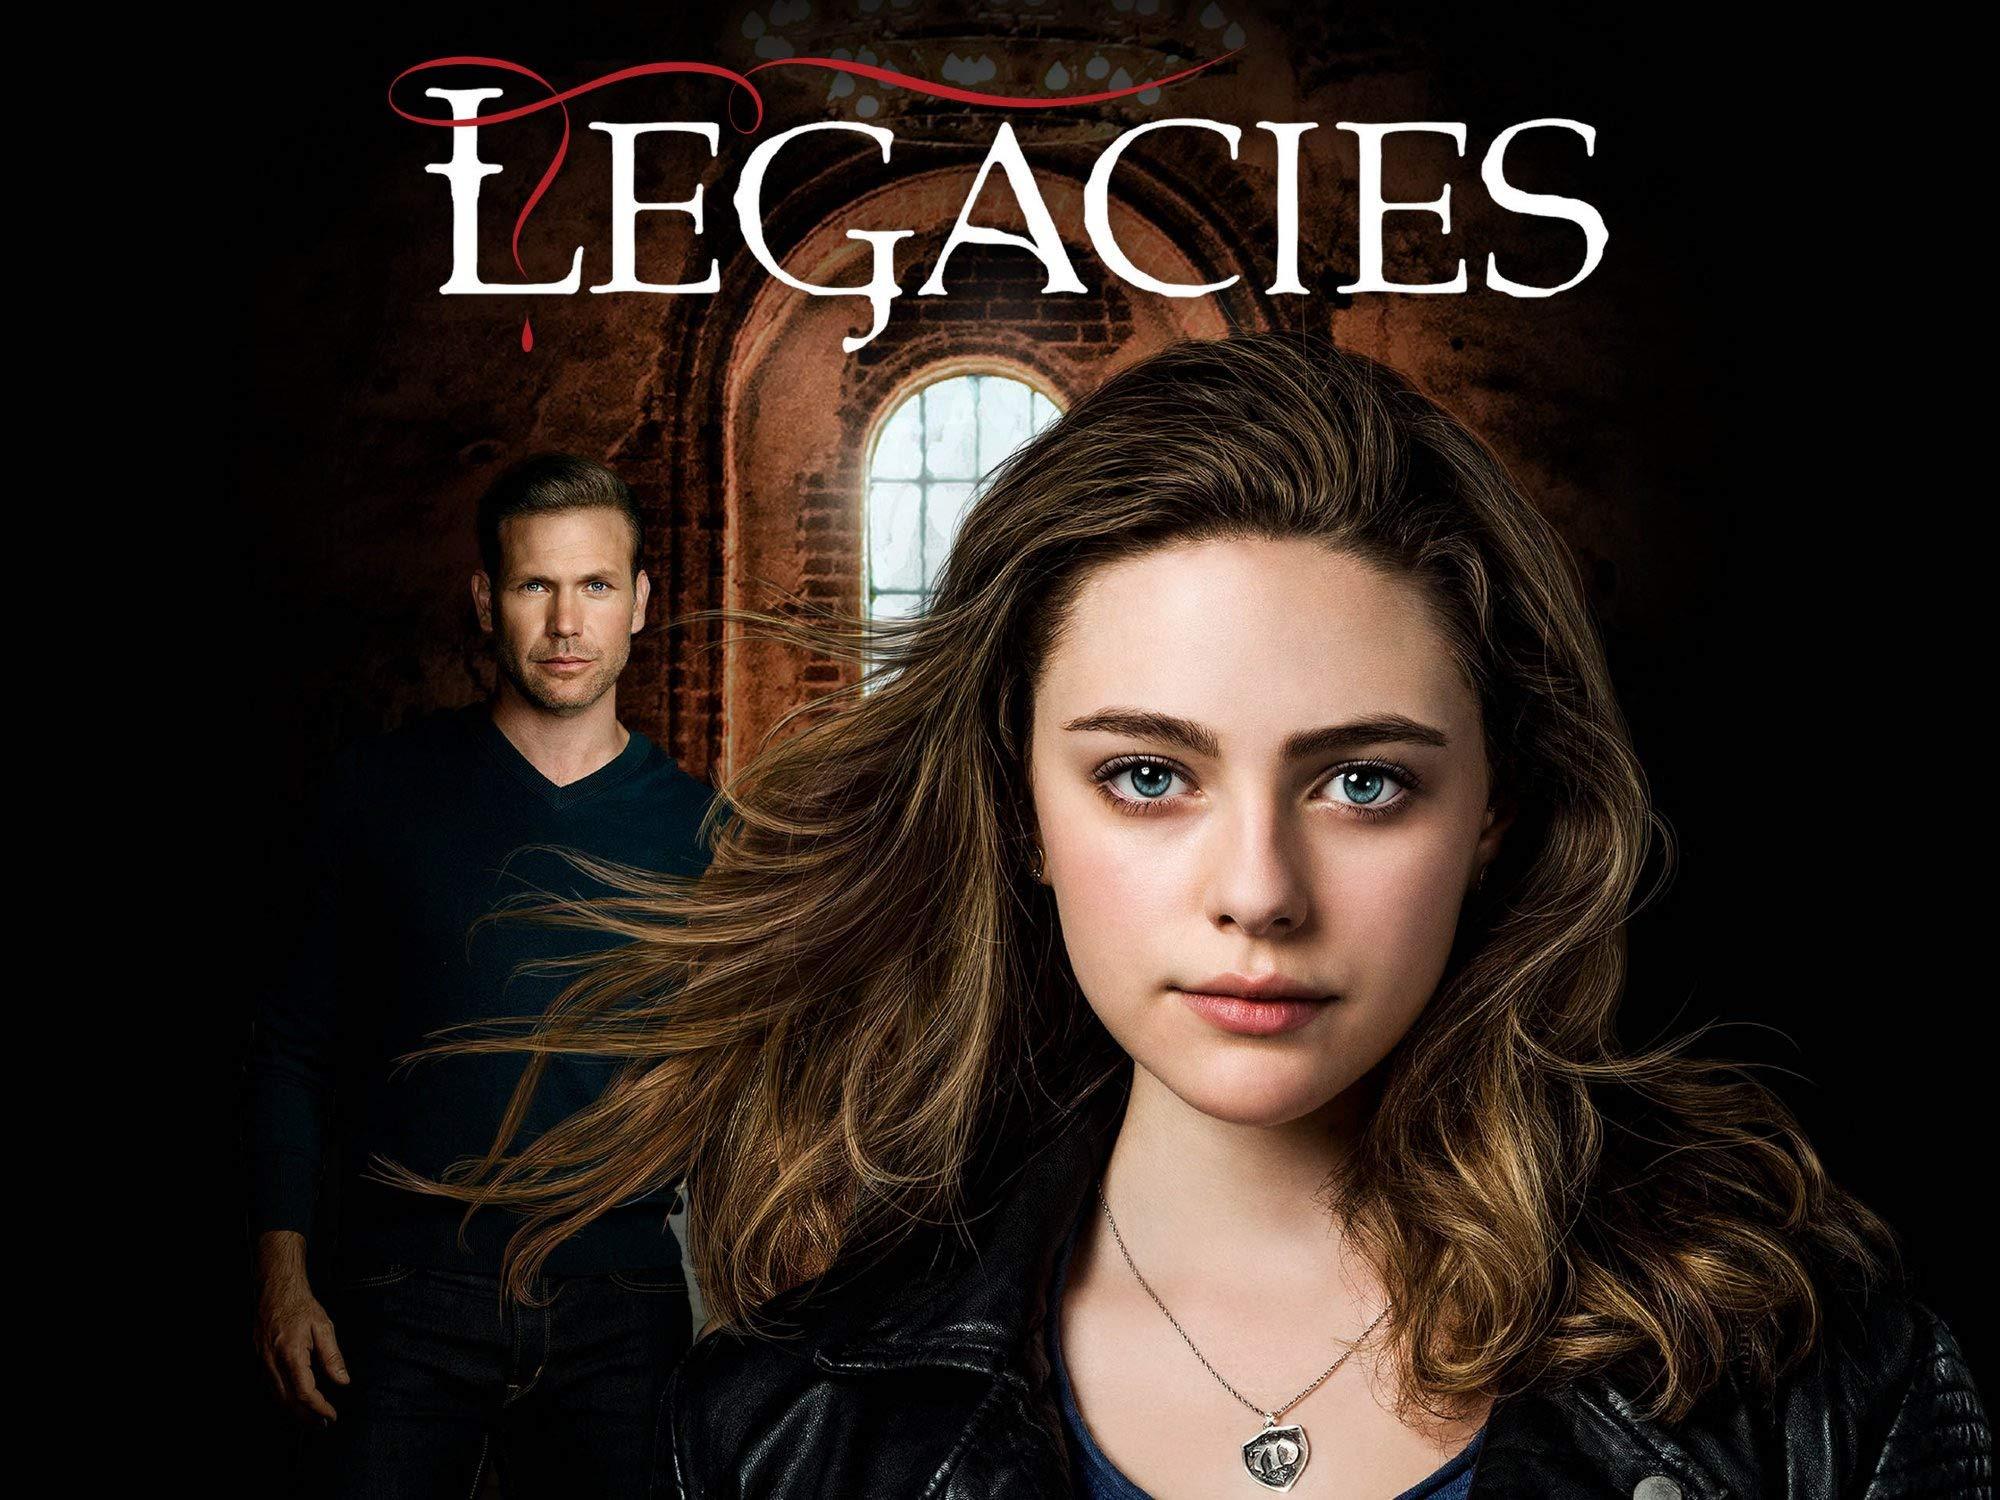 legacies season 1 episode 3 online free